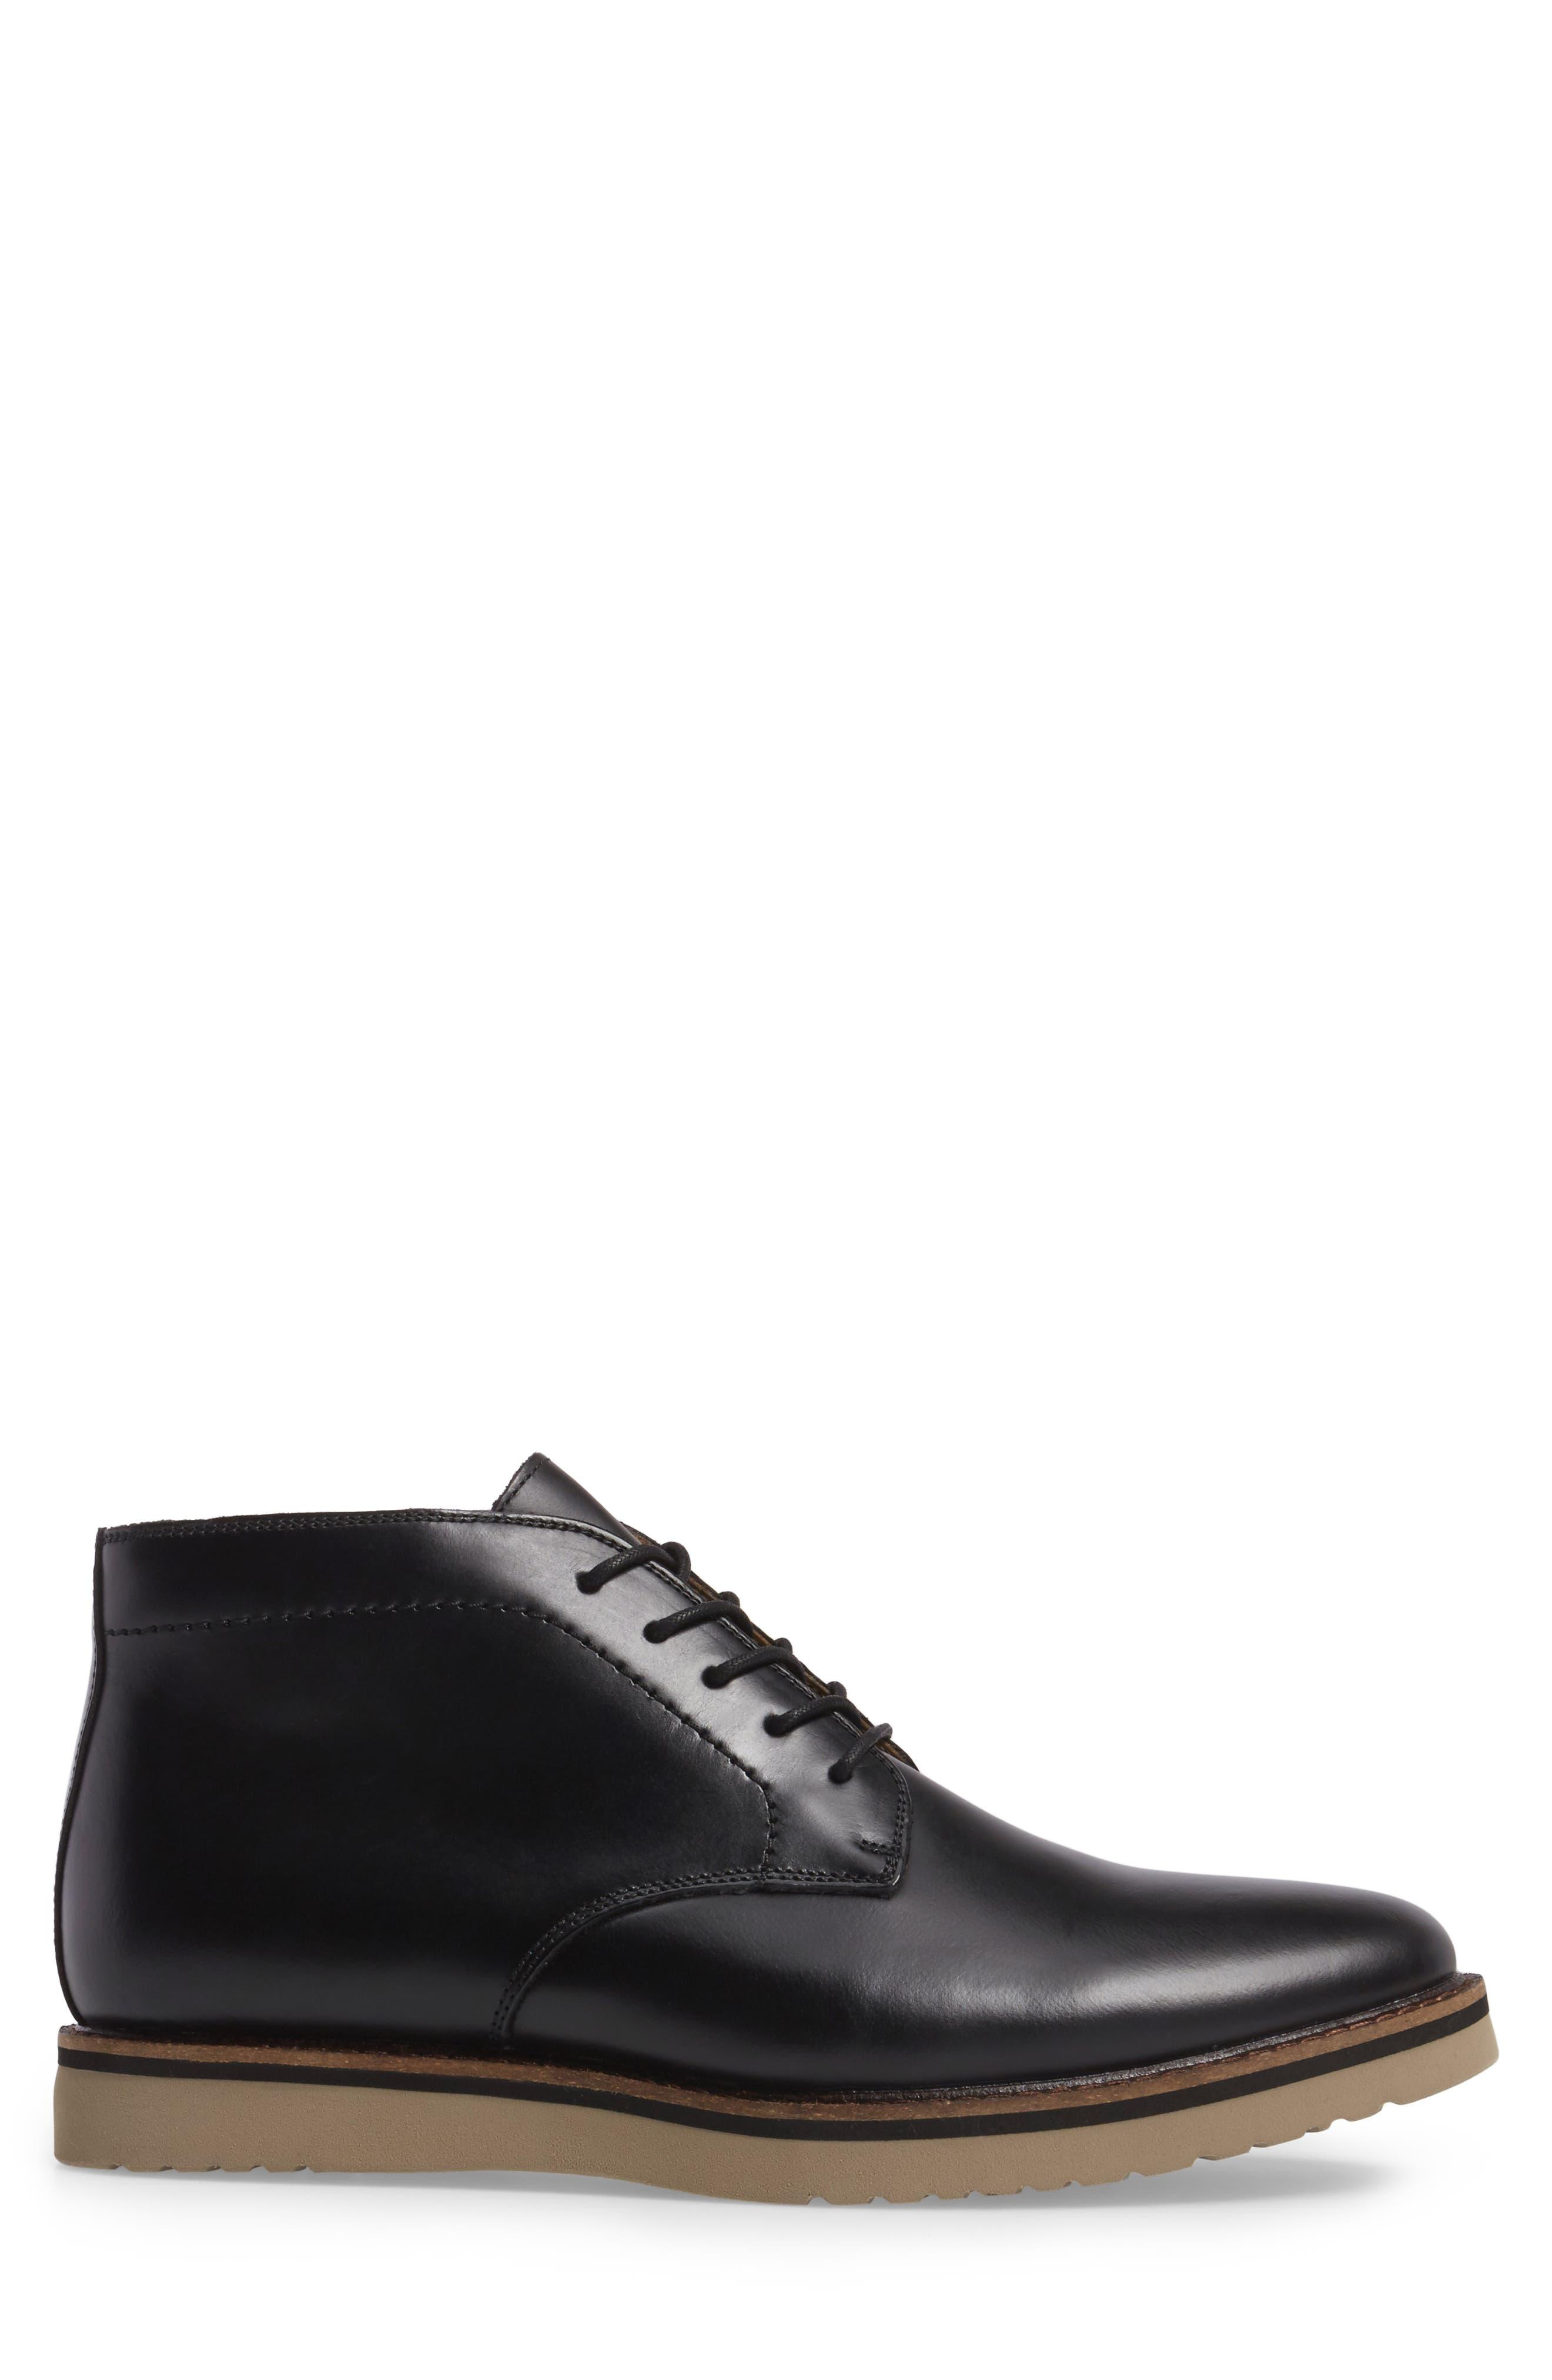 'Farley' Chukka Boot,                             Alternate thumbnail 3, color,                             Black/ Black Leather